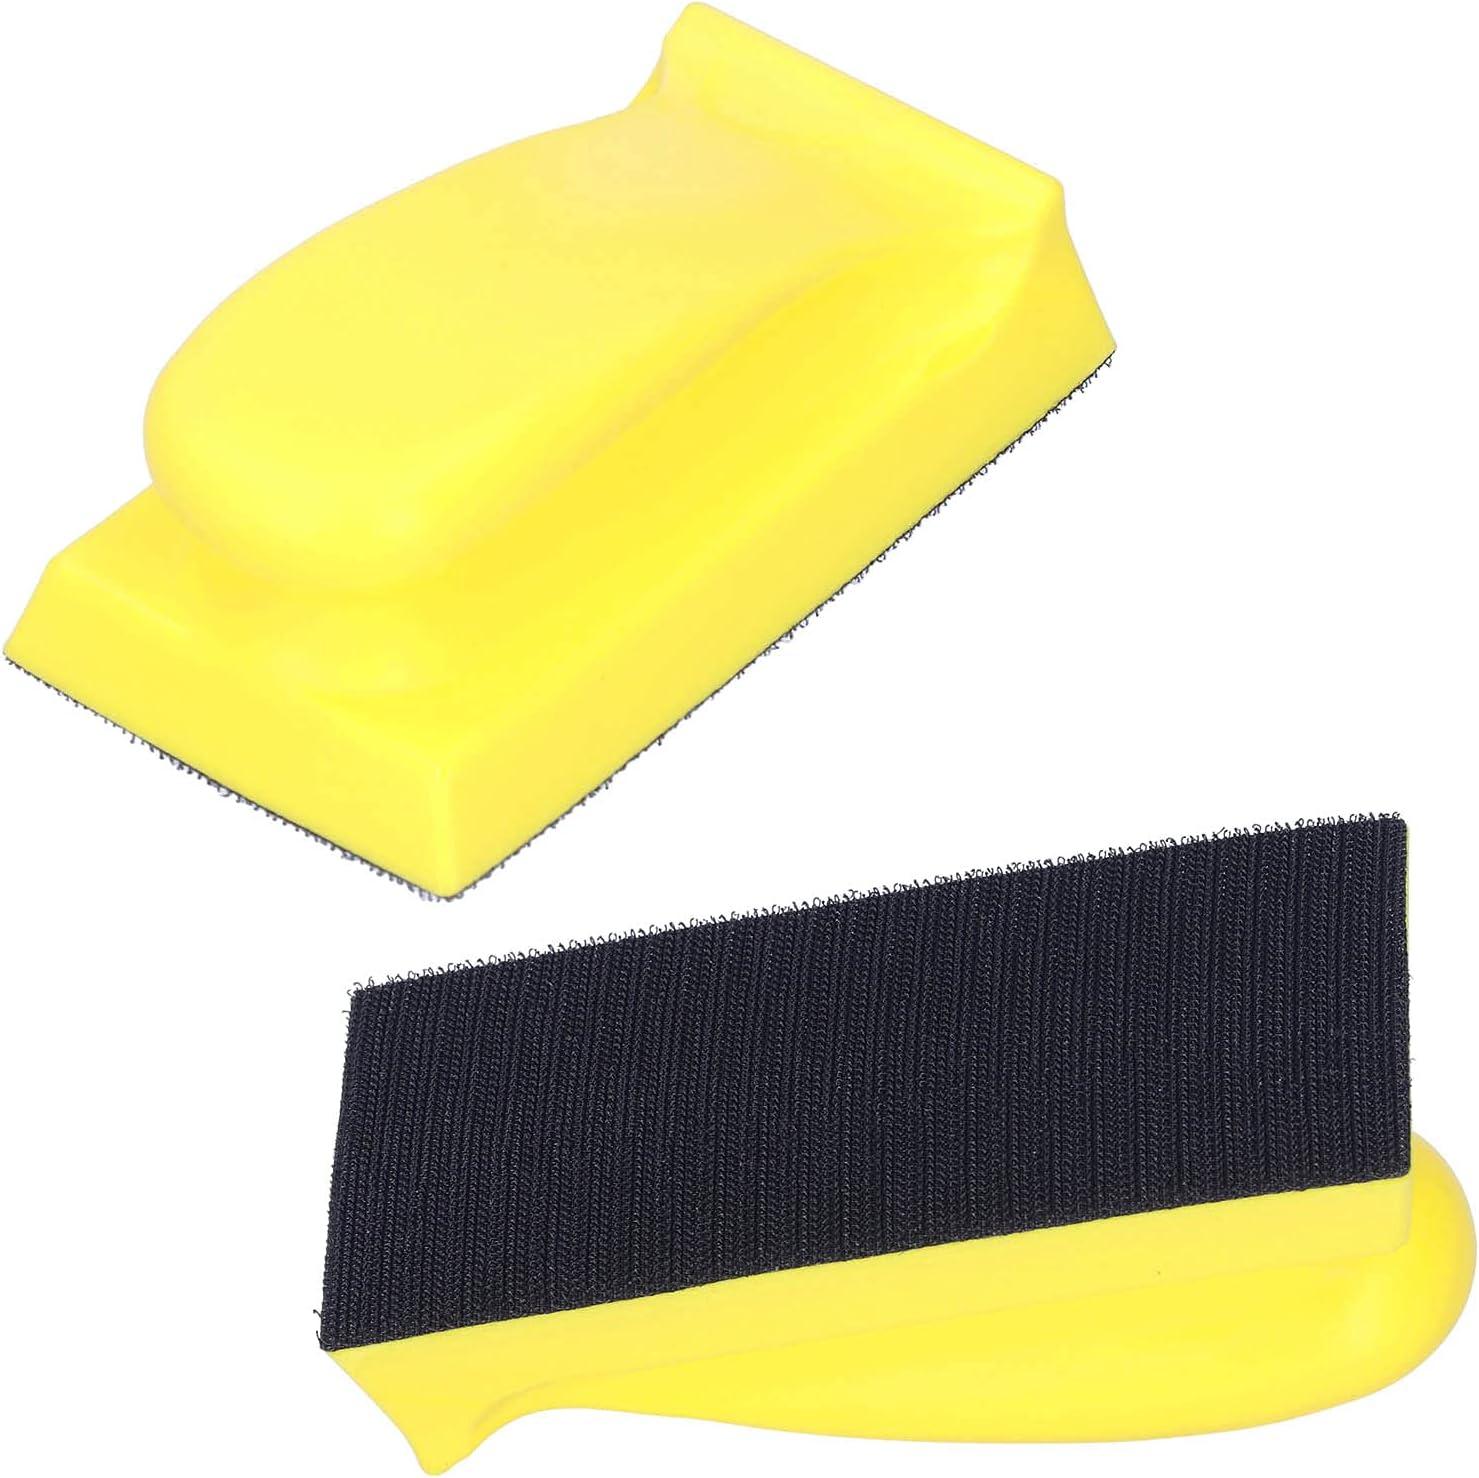 Sanding Block Rectangular 135 x Foam Hand PU SEAL limited product 55% OFF 70mm